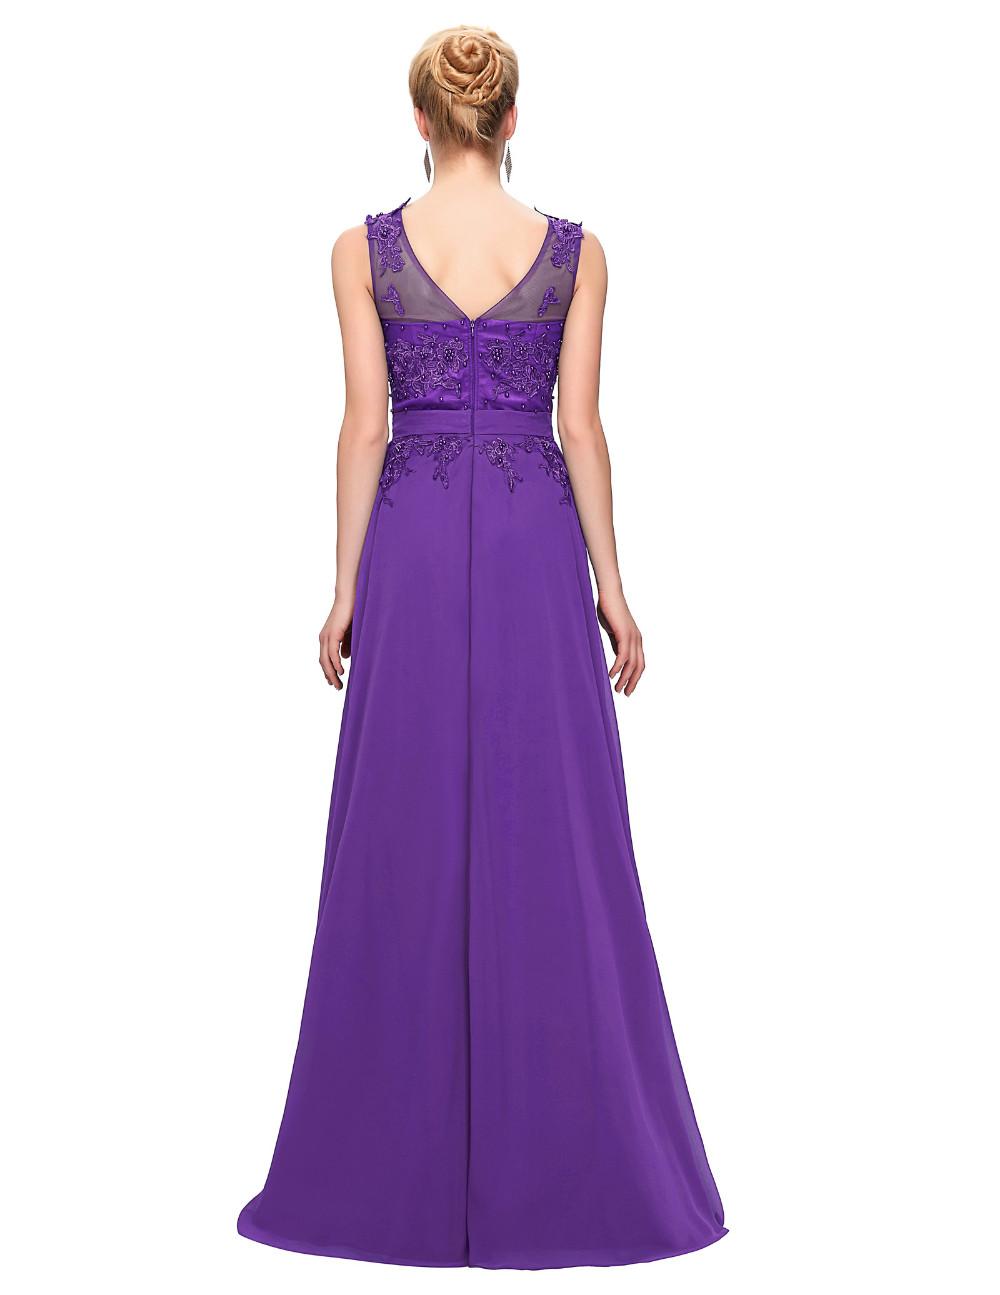 Grace Karin Elegant Long Evening Dresses 2016 Chiffon Pink Purple Red Royal Blue Black Formal Evening Dress Gown Abendkleider 34